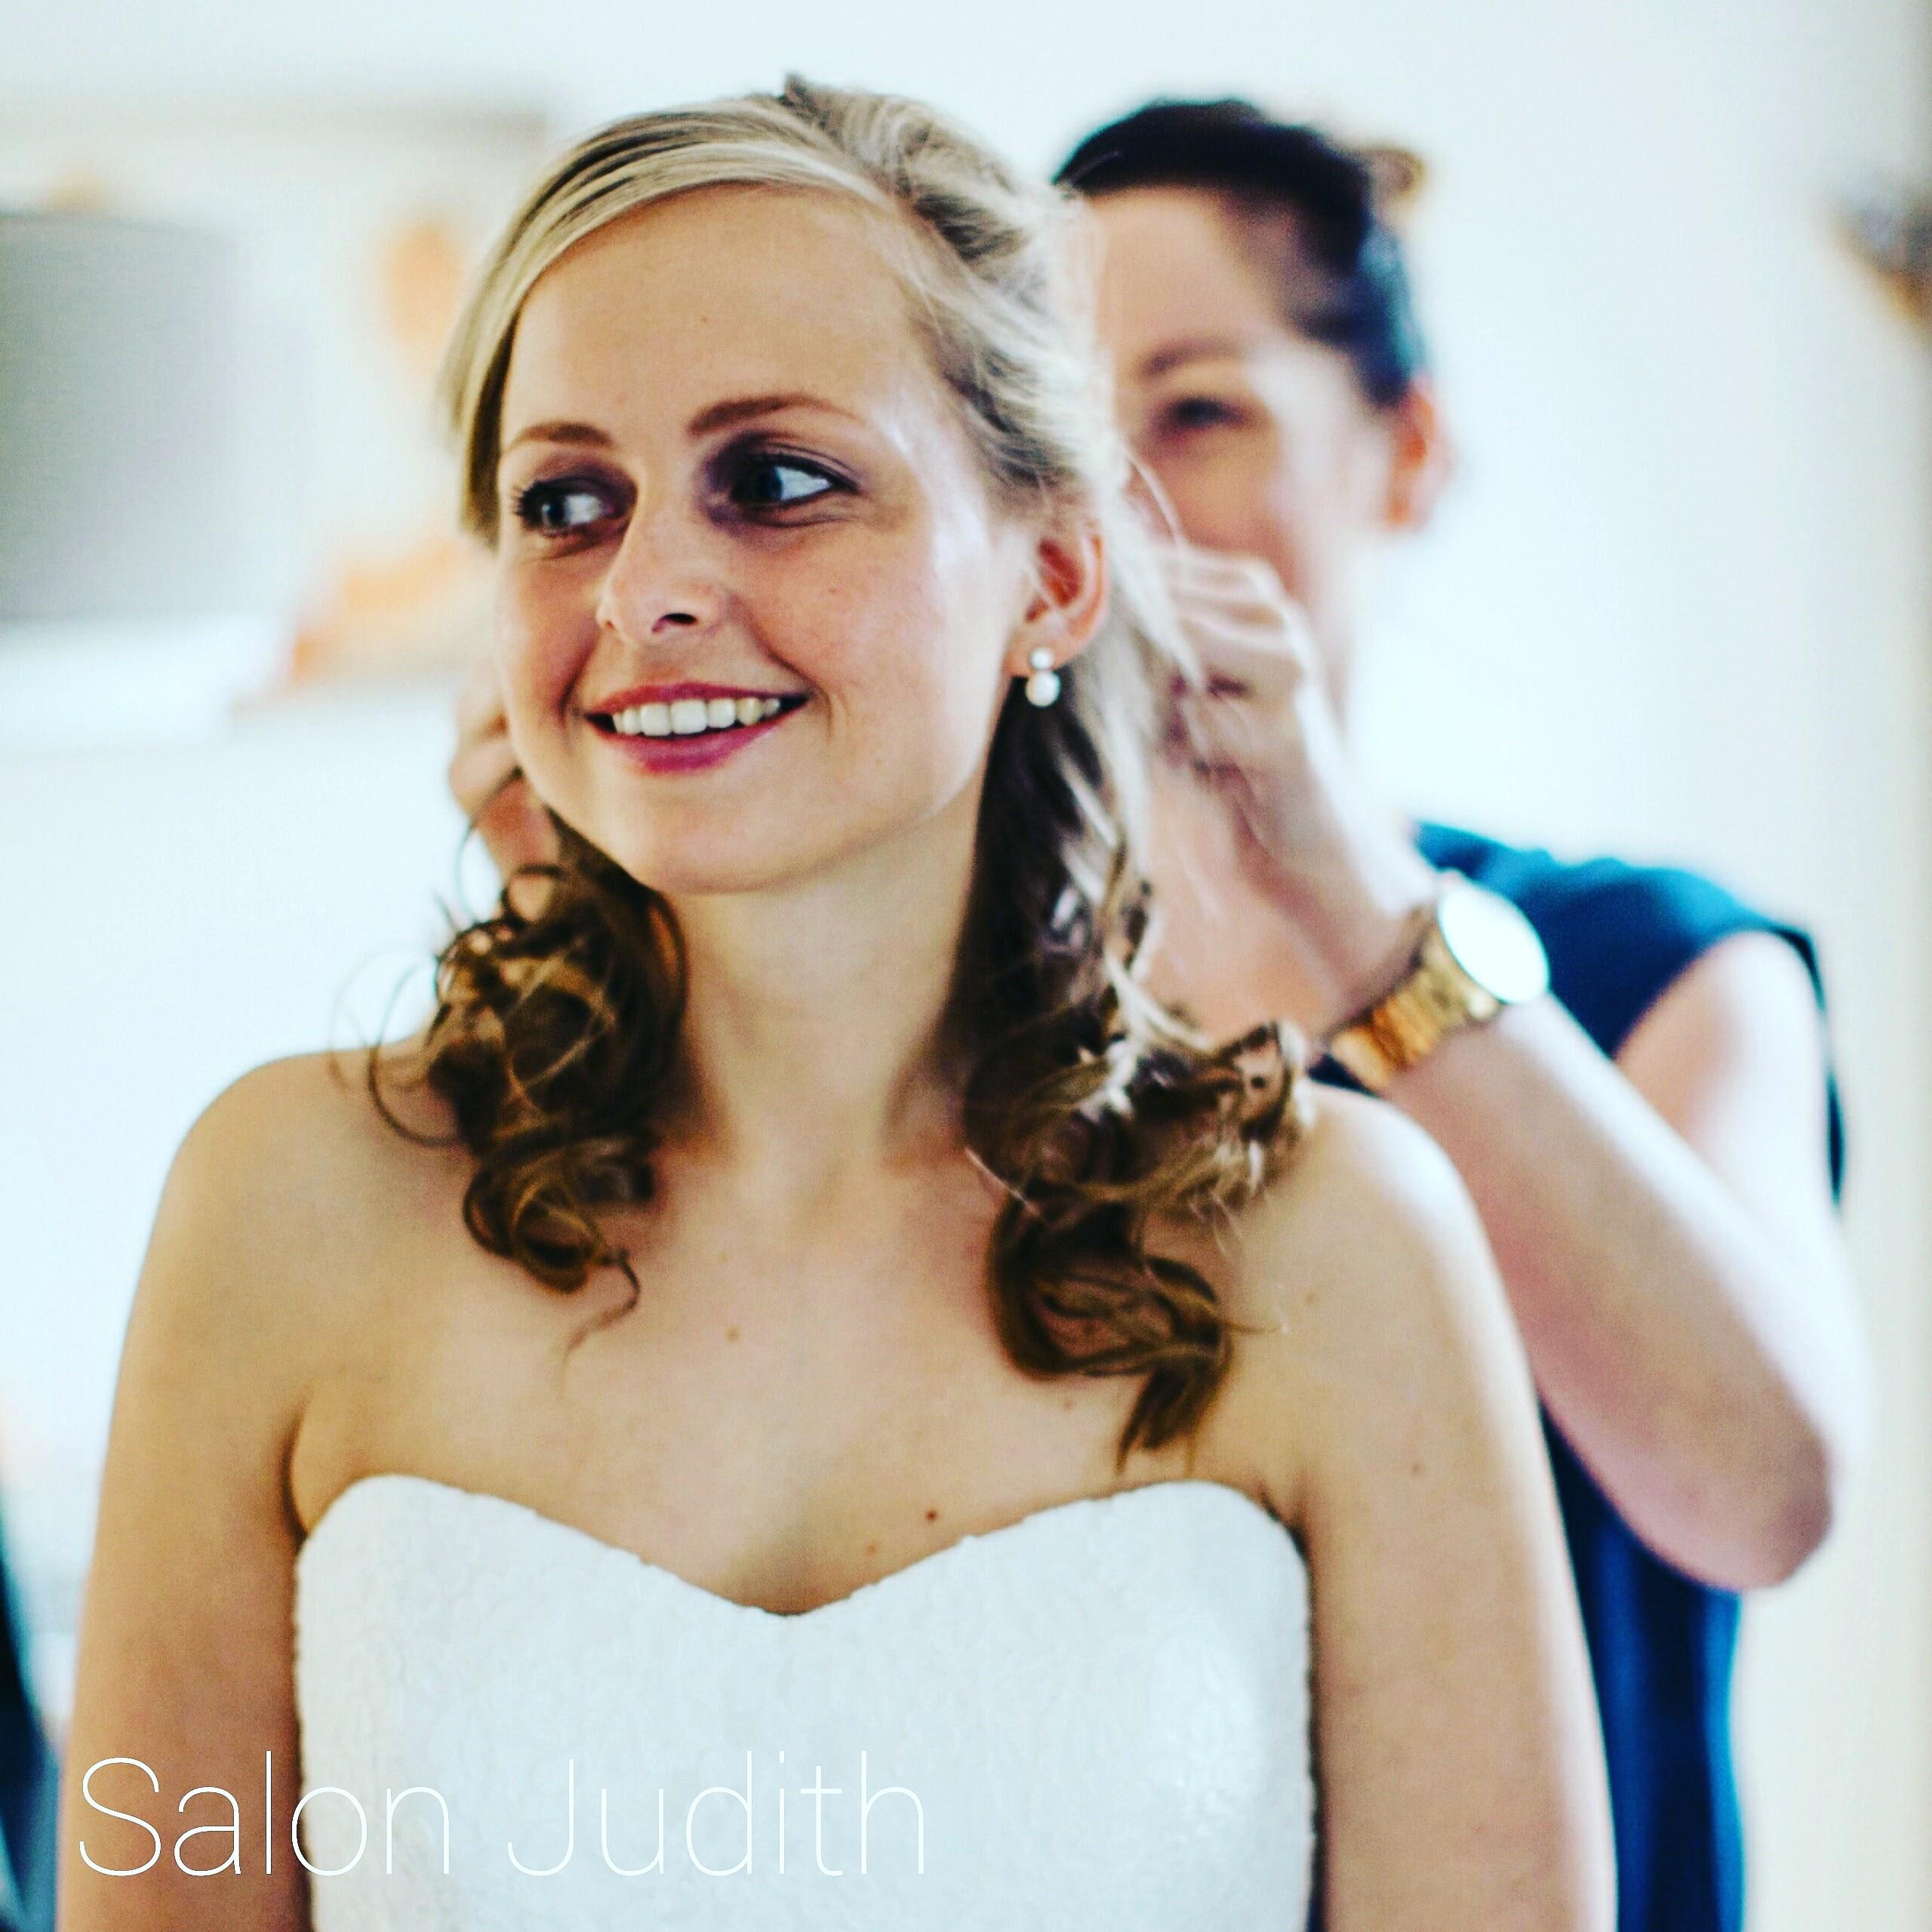 Bruidsarrangement, Salon Judith, visagie, Bruid